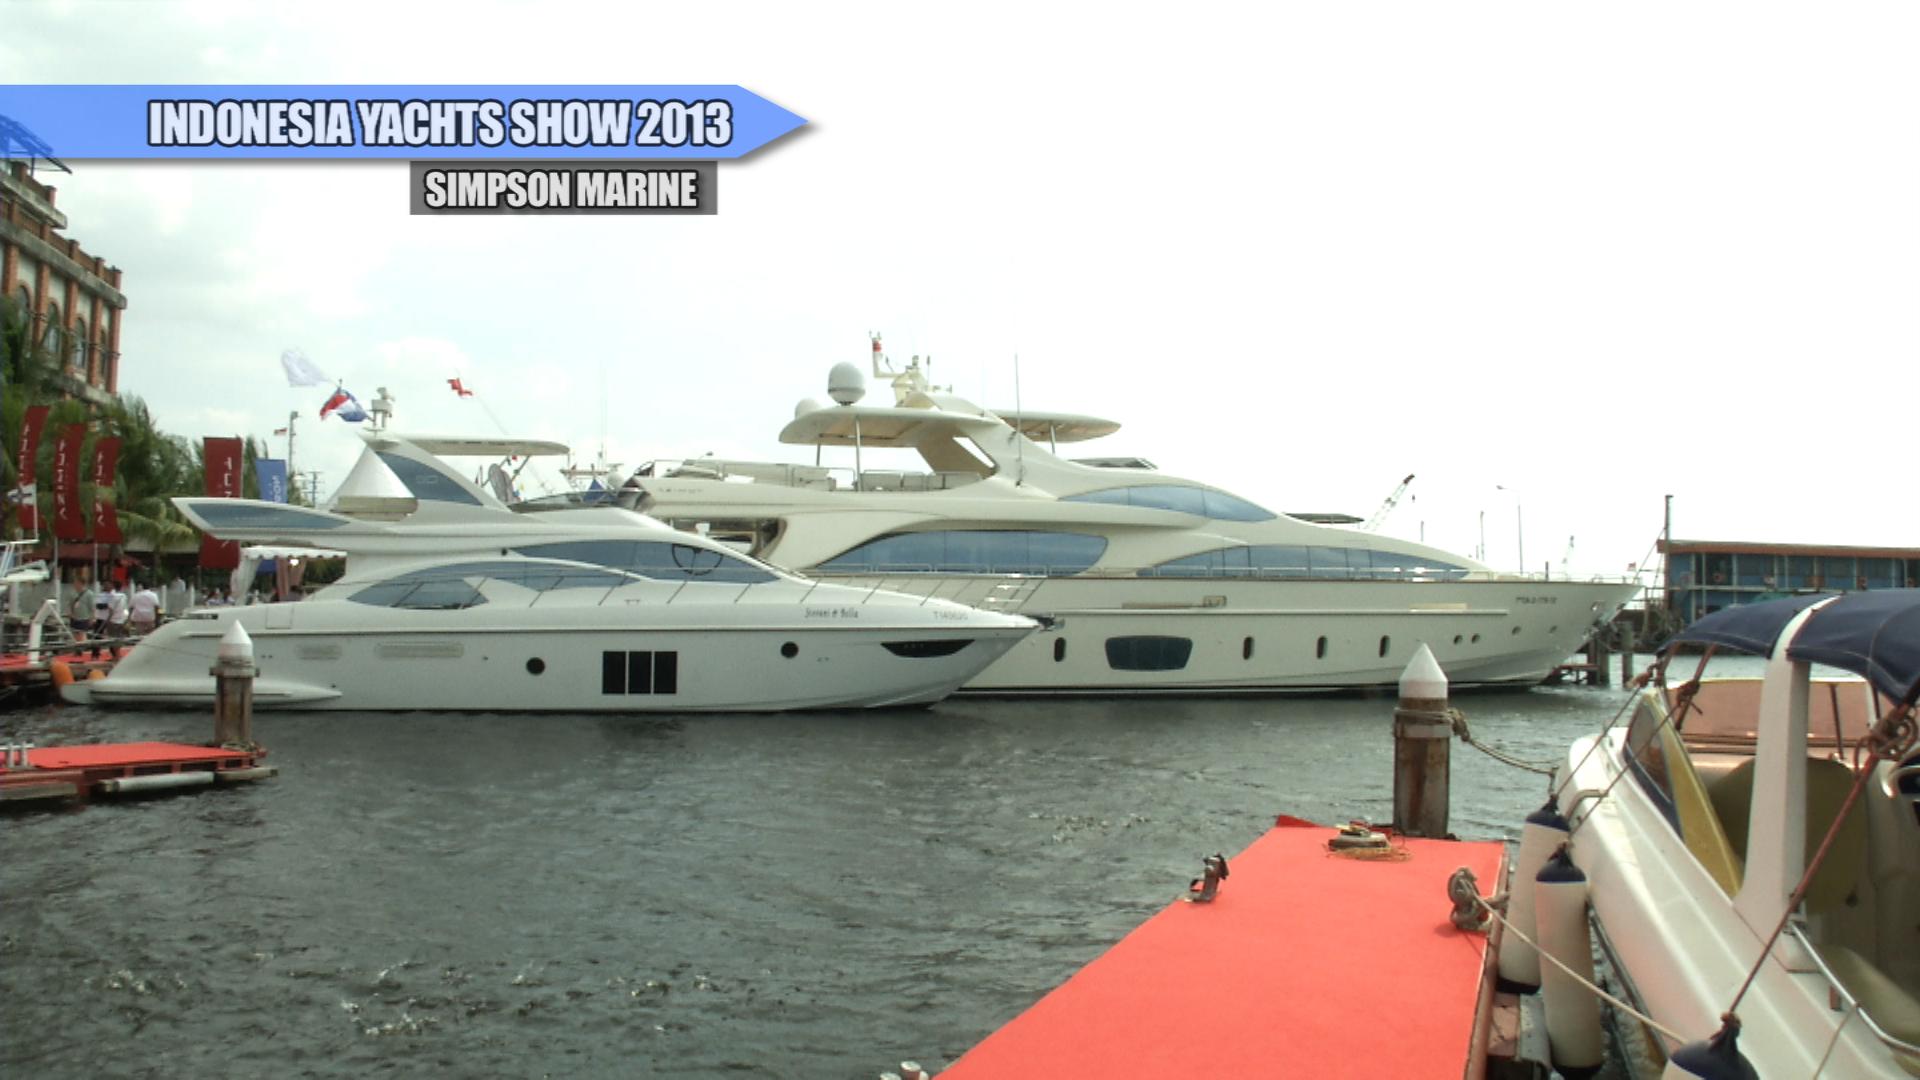 Simpson Marine (Indonesia Yachts Show 2013)